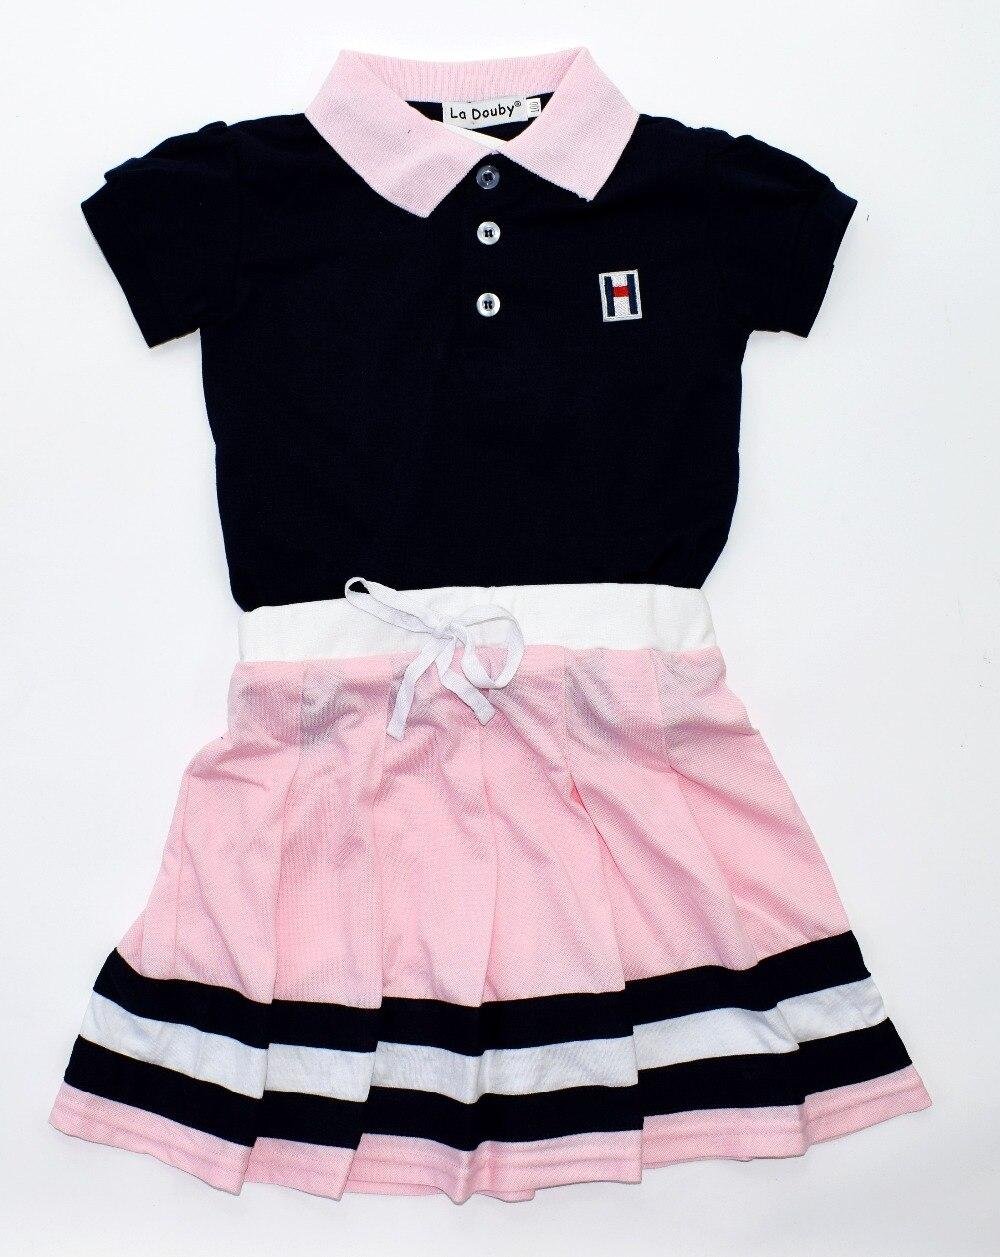 Minnie Mouse Baby Kid Girls Princess Clothes Cartoon Party Mini Dress<br><br>Aliexpress